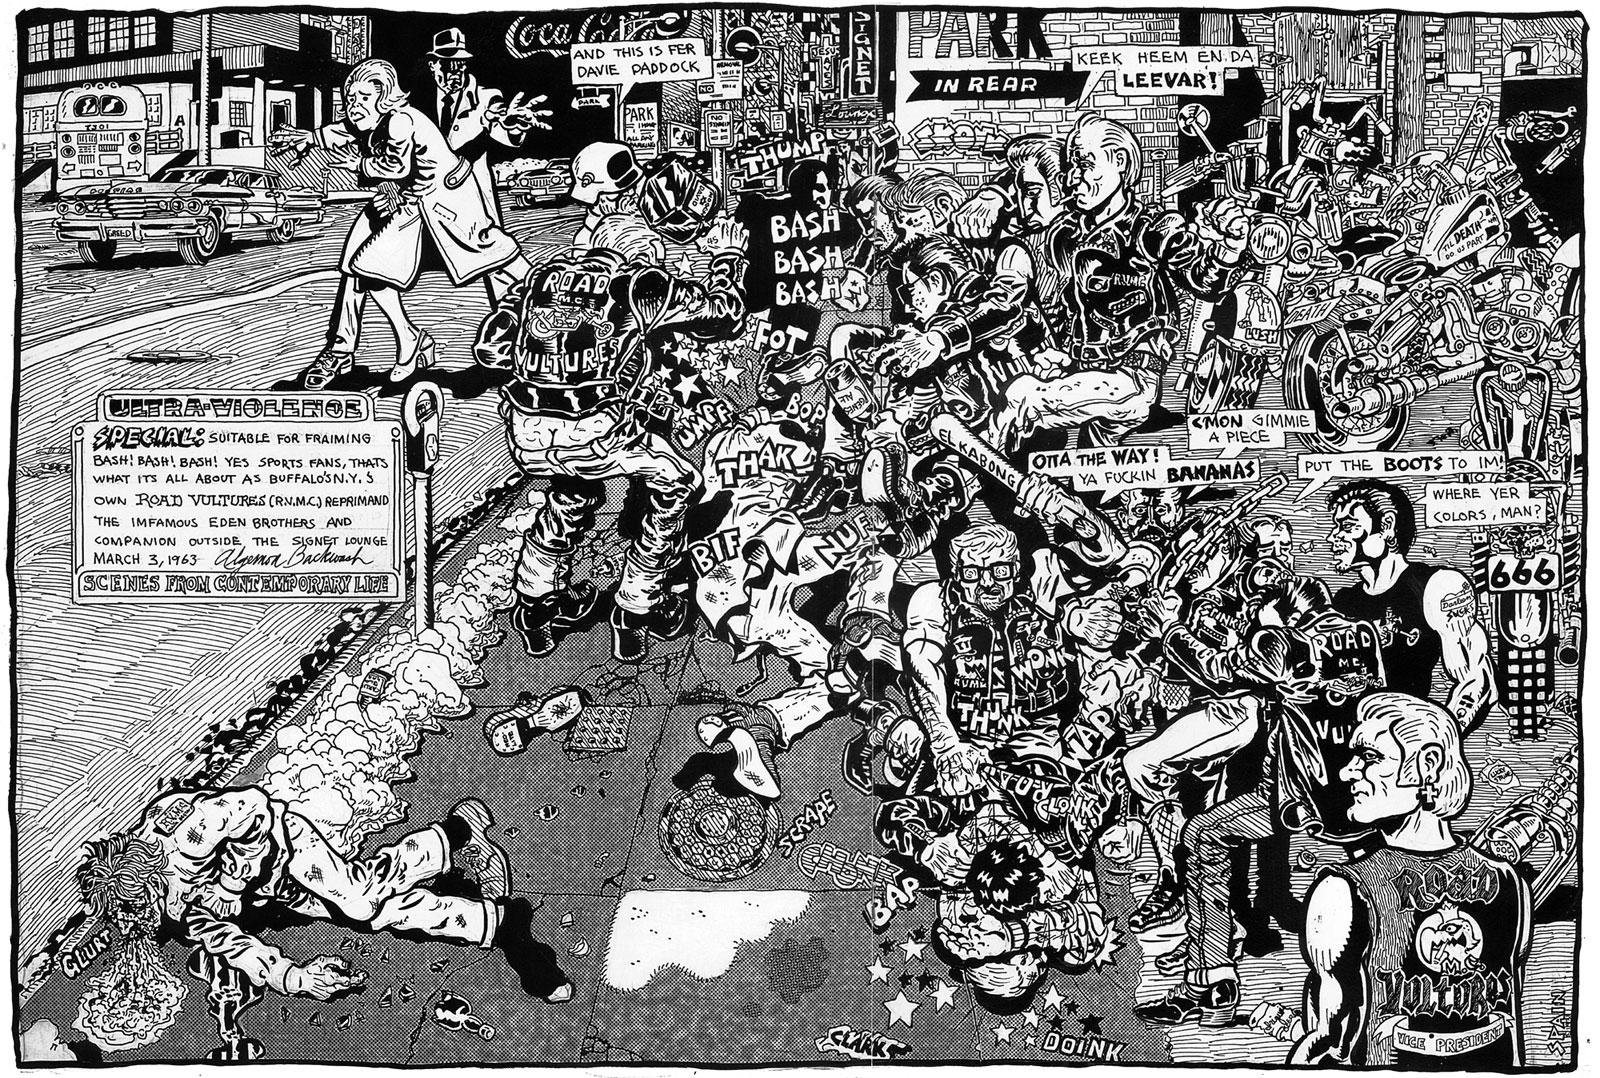 Buffalo, march 3, 1963 poster